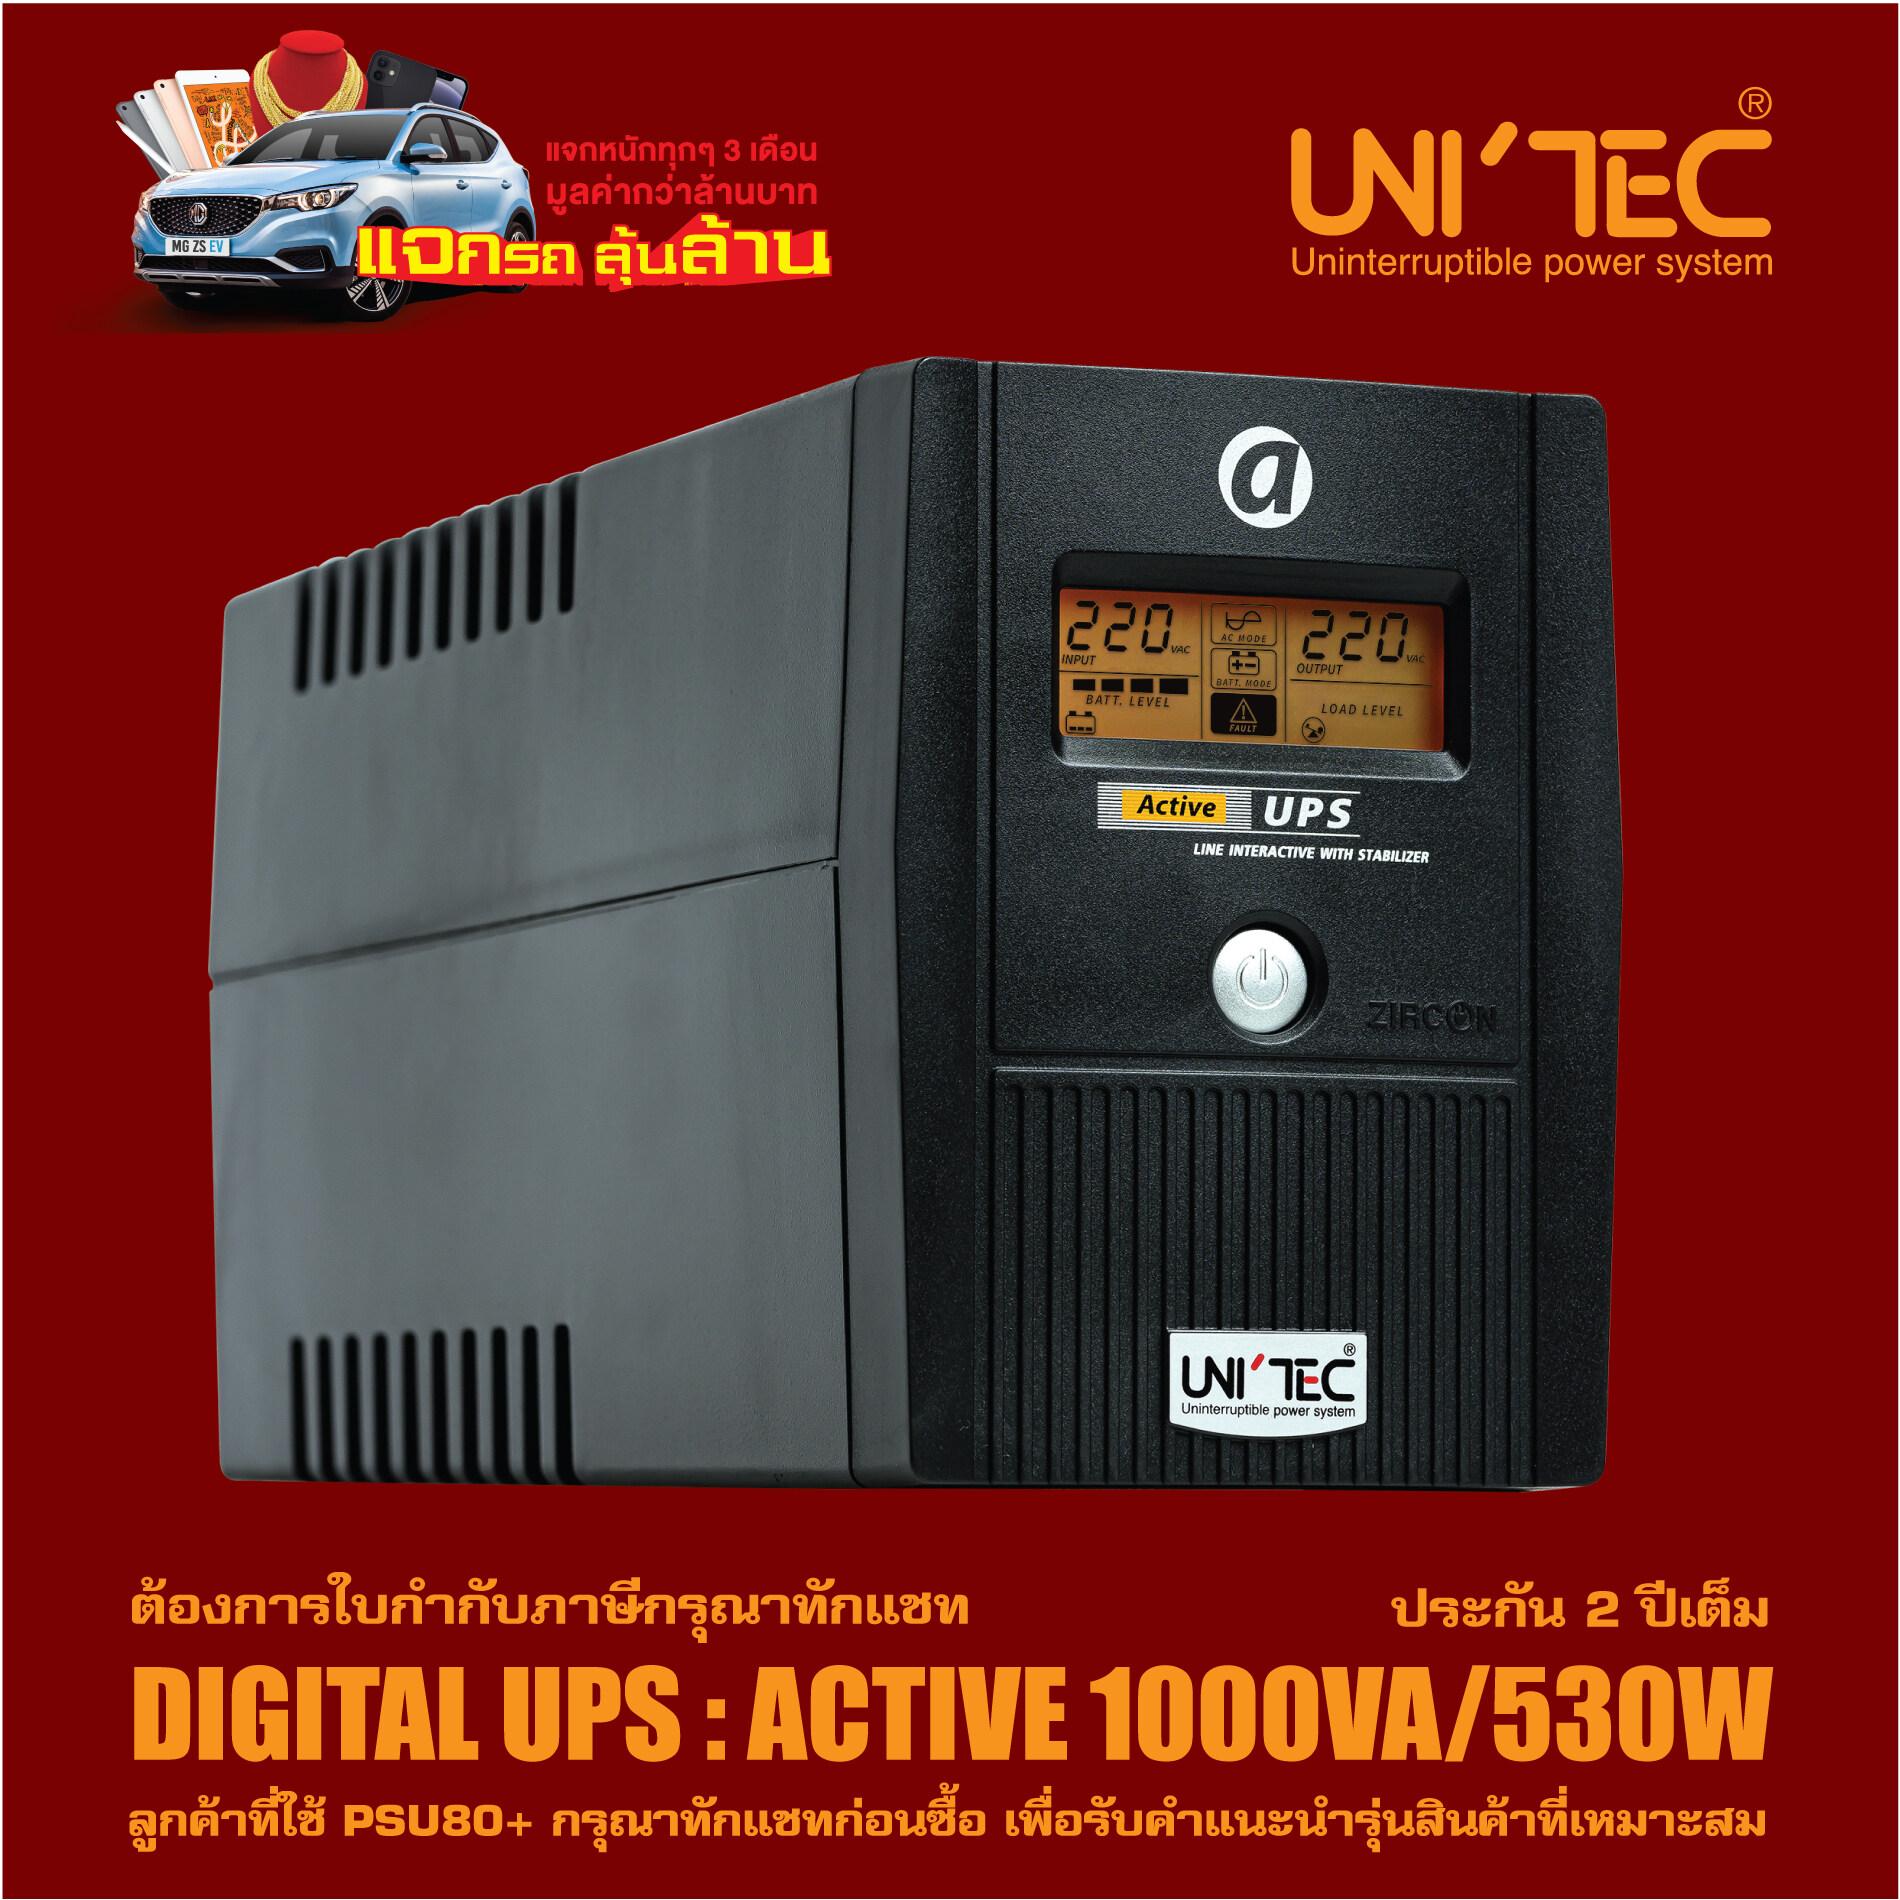 Shock-Sale! Active1000va/530w Digital Ups Unitec เหมาะกับคอมพิวเตอร์ทั่วไป/ออลอินวัน/กล้องวงจรปิด ประกัน 2ปี.